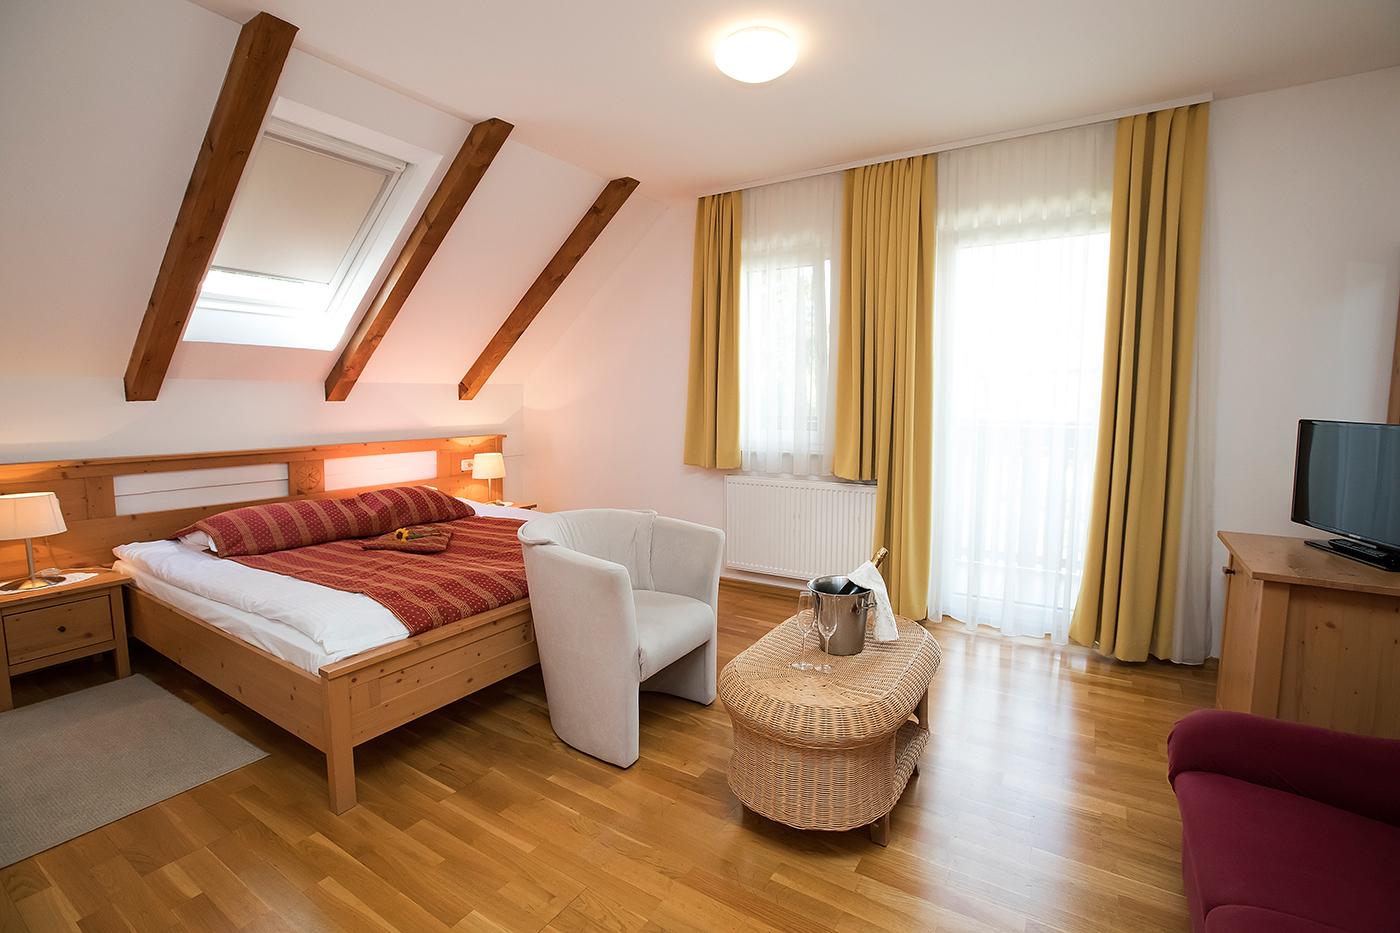 kristal_hotel_csaladi_szoba_44